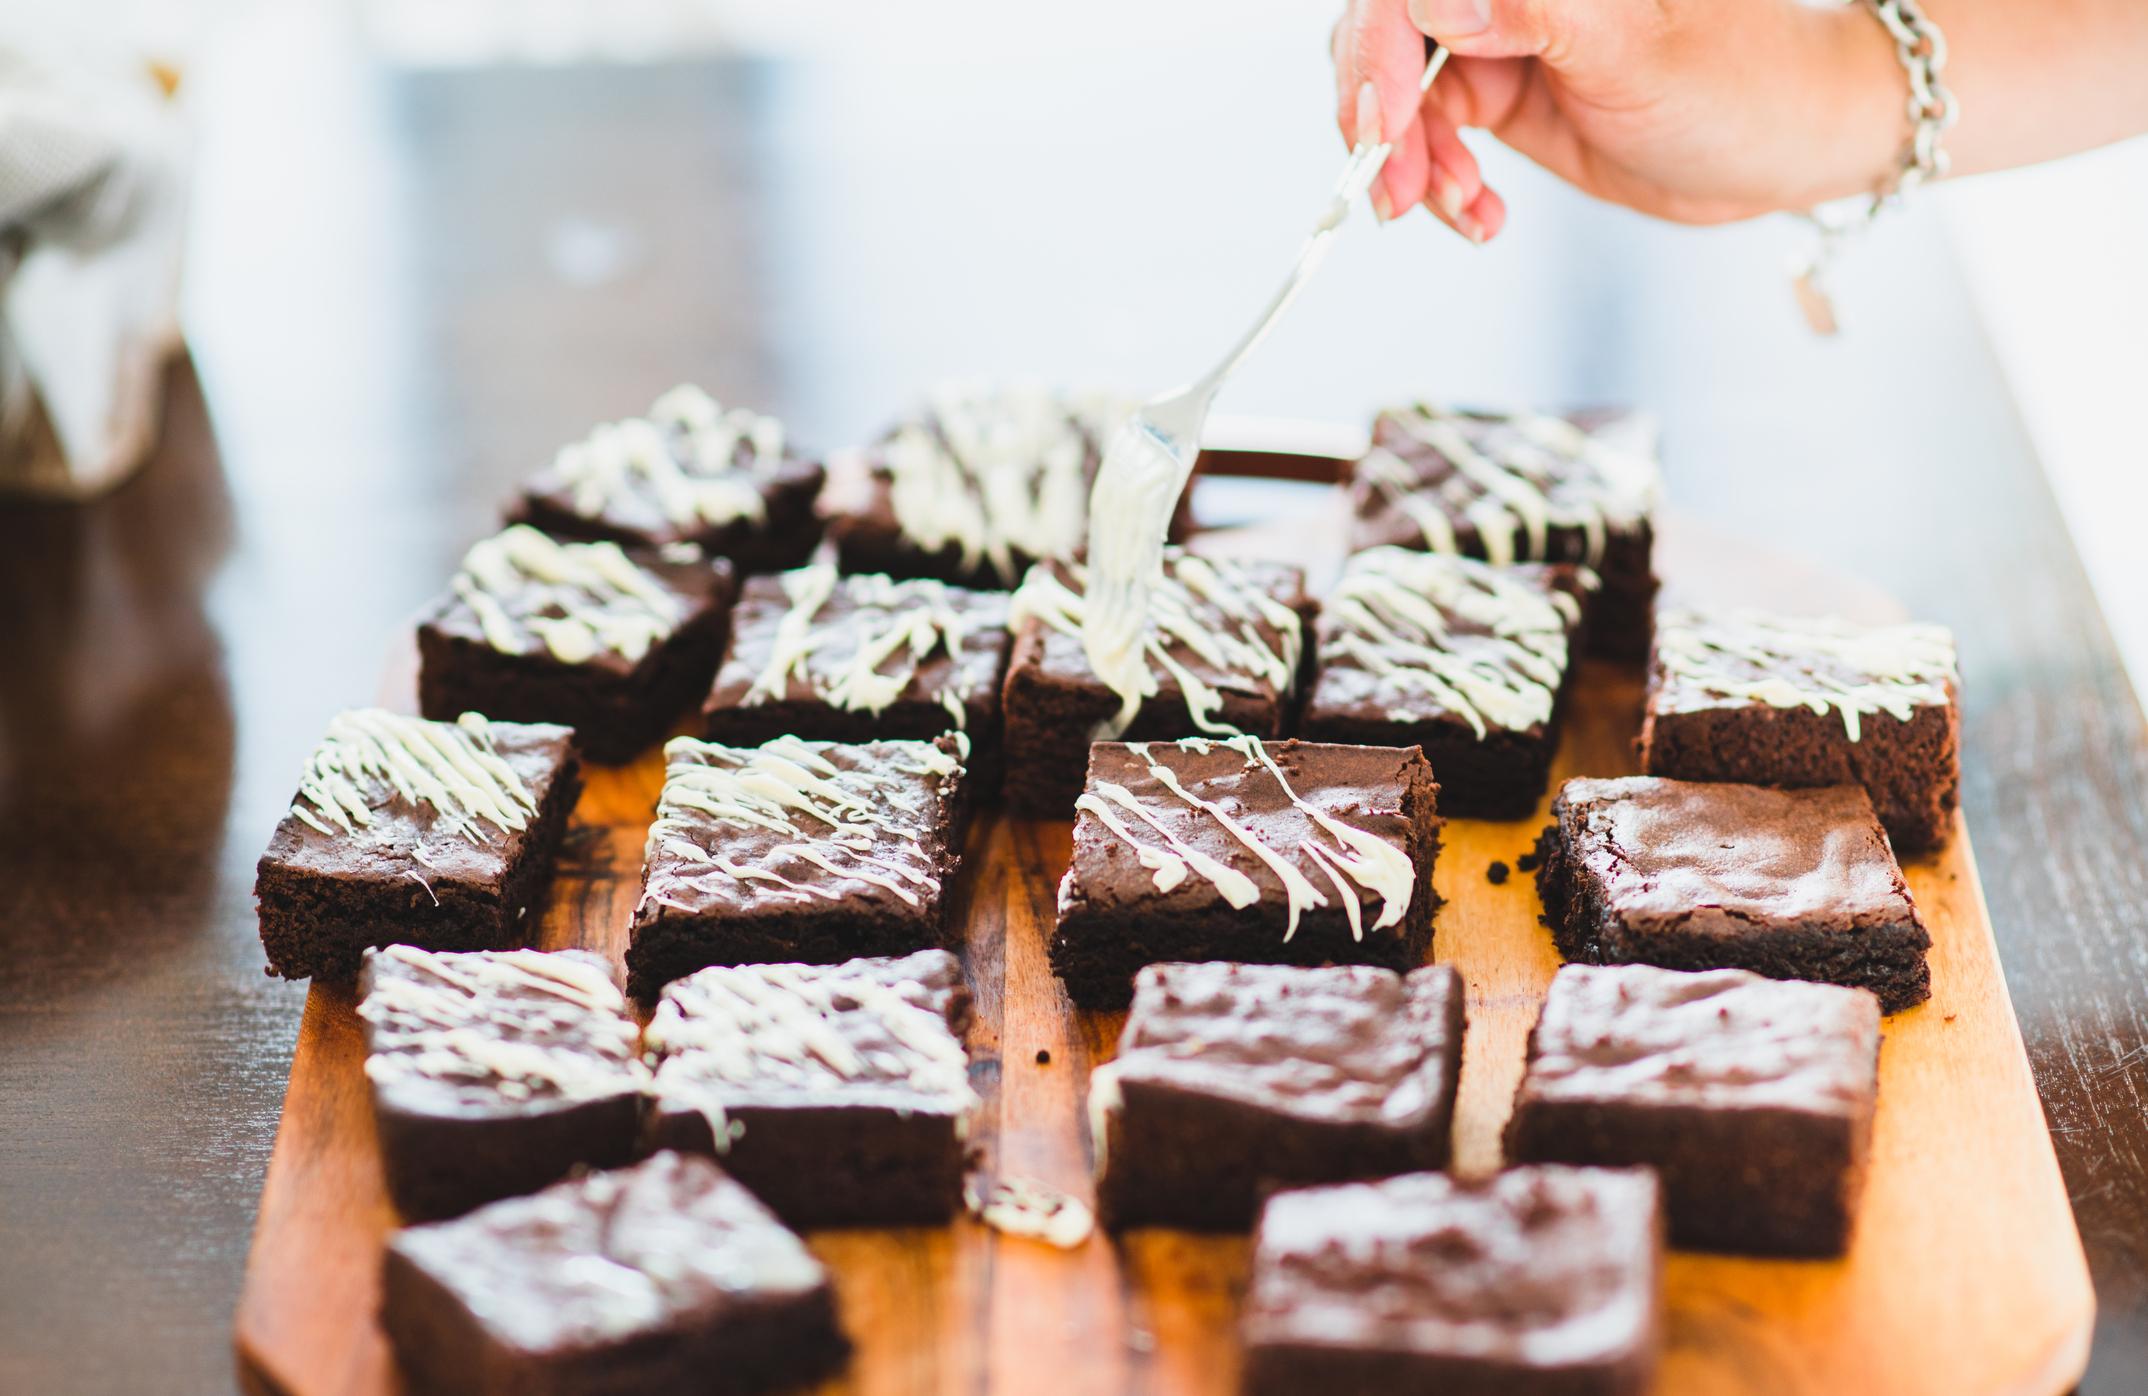 Groovy Gluten Free Bakeries That Ship Lovetoknow Funny Birthday Cards Online Overcheapnameinfo